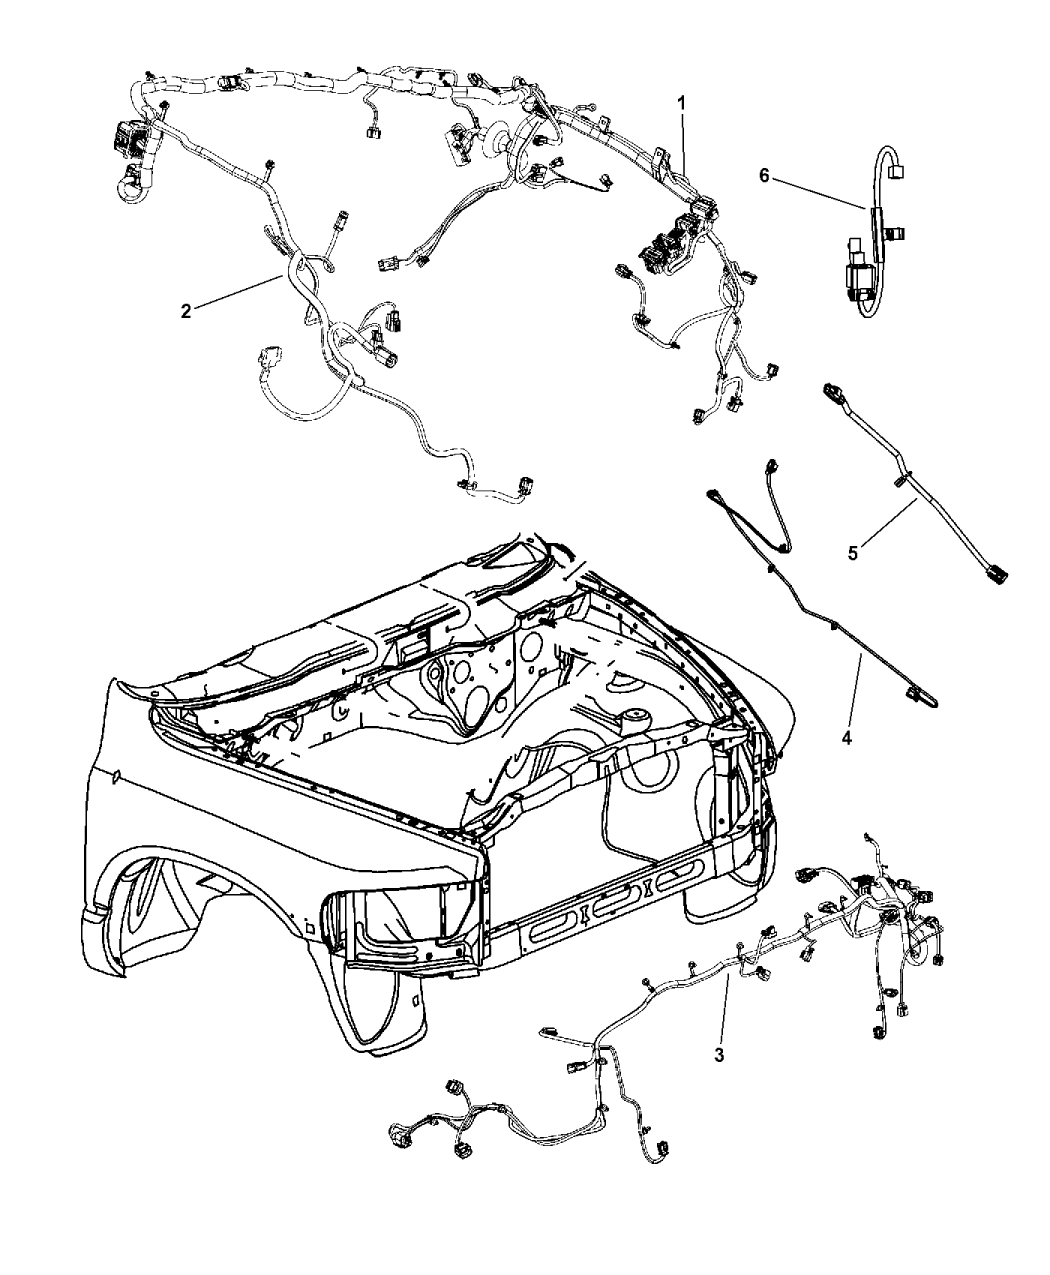 4801811AA - Genuine Dodge WIRING-JUMPER